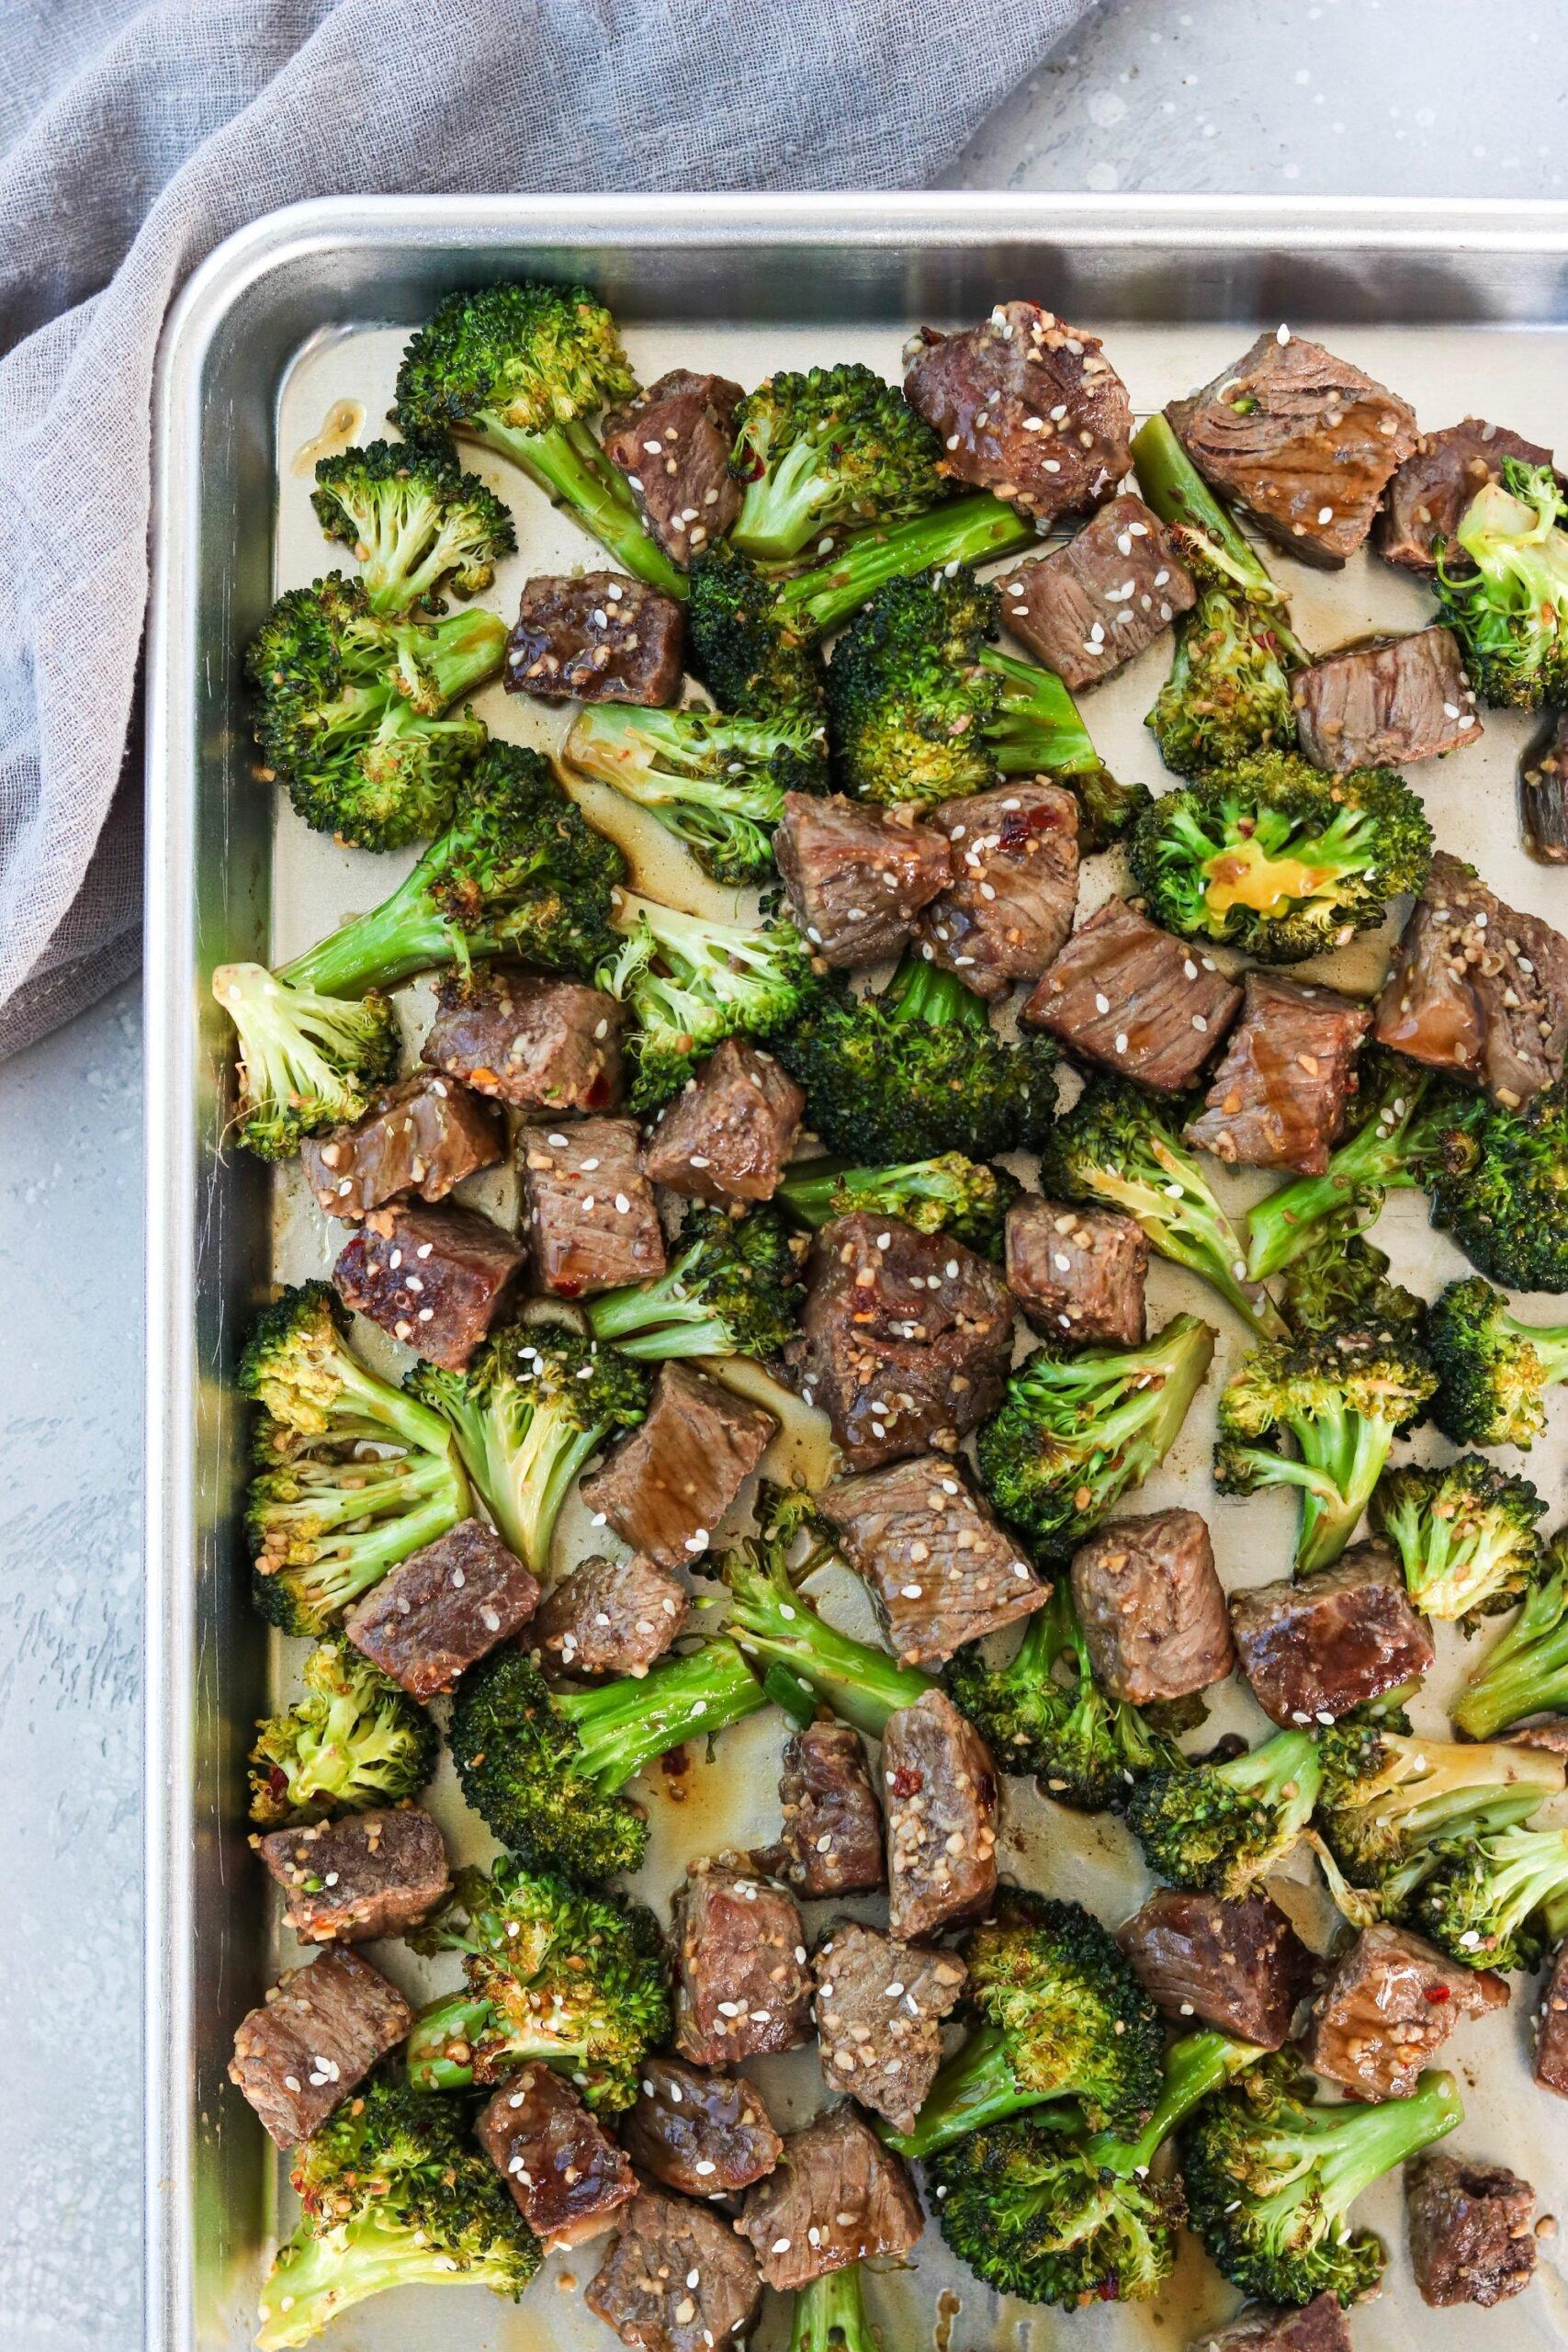 Sheet Pan Beef And Broccoli Whole30 Keto Mary S Whole Life